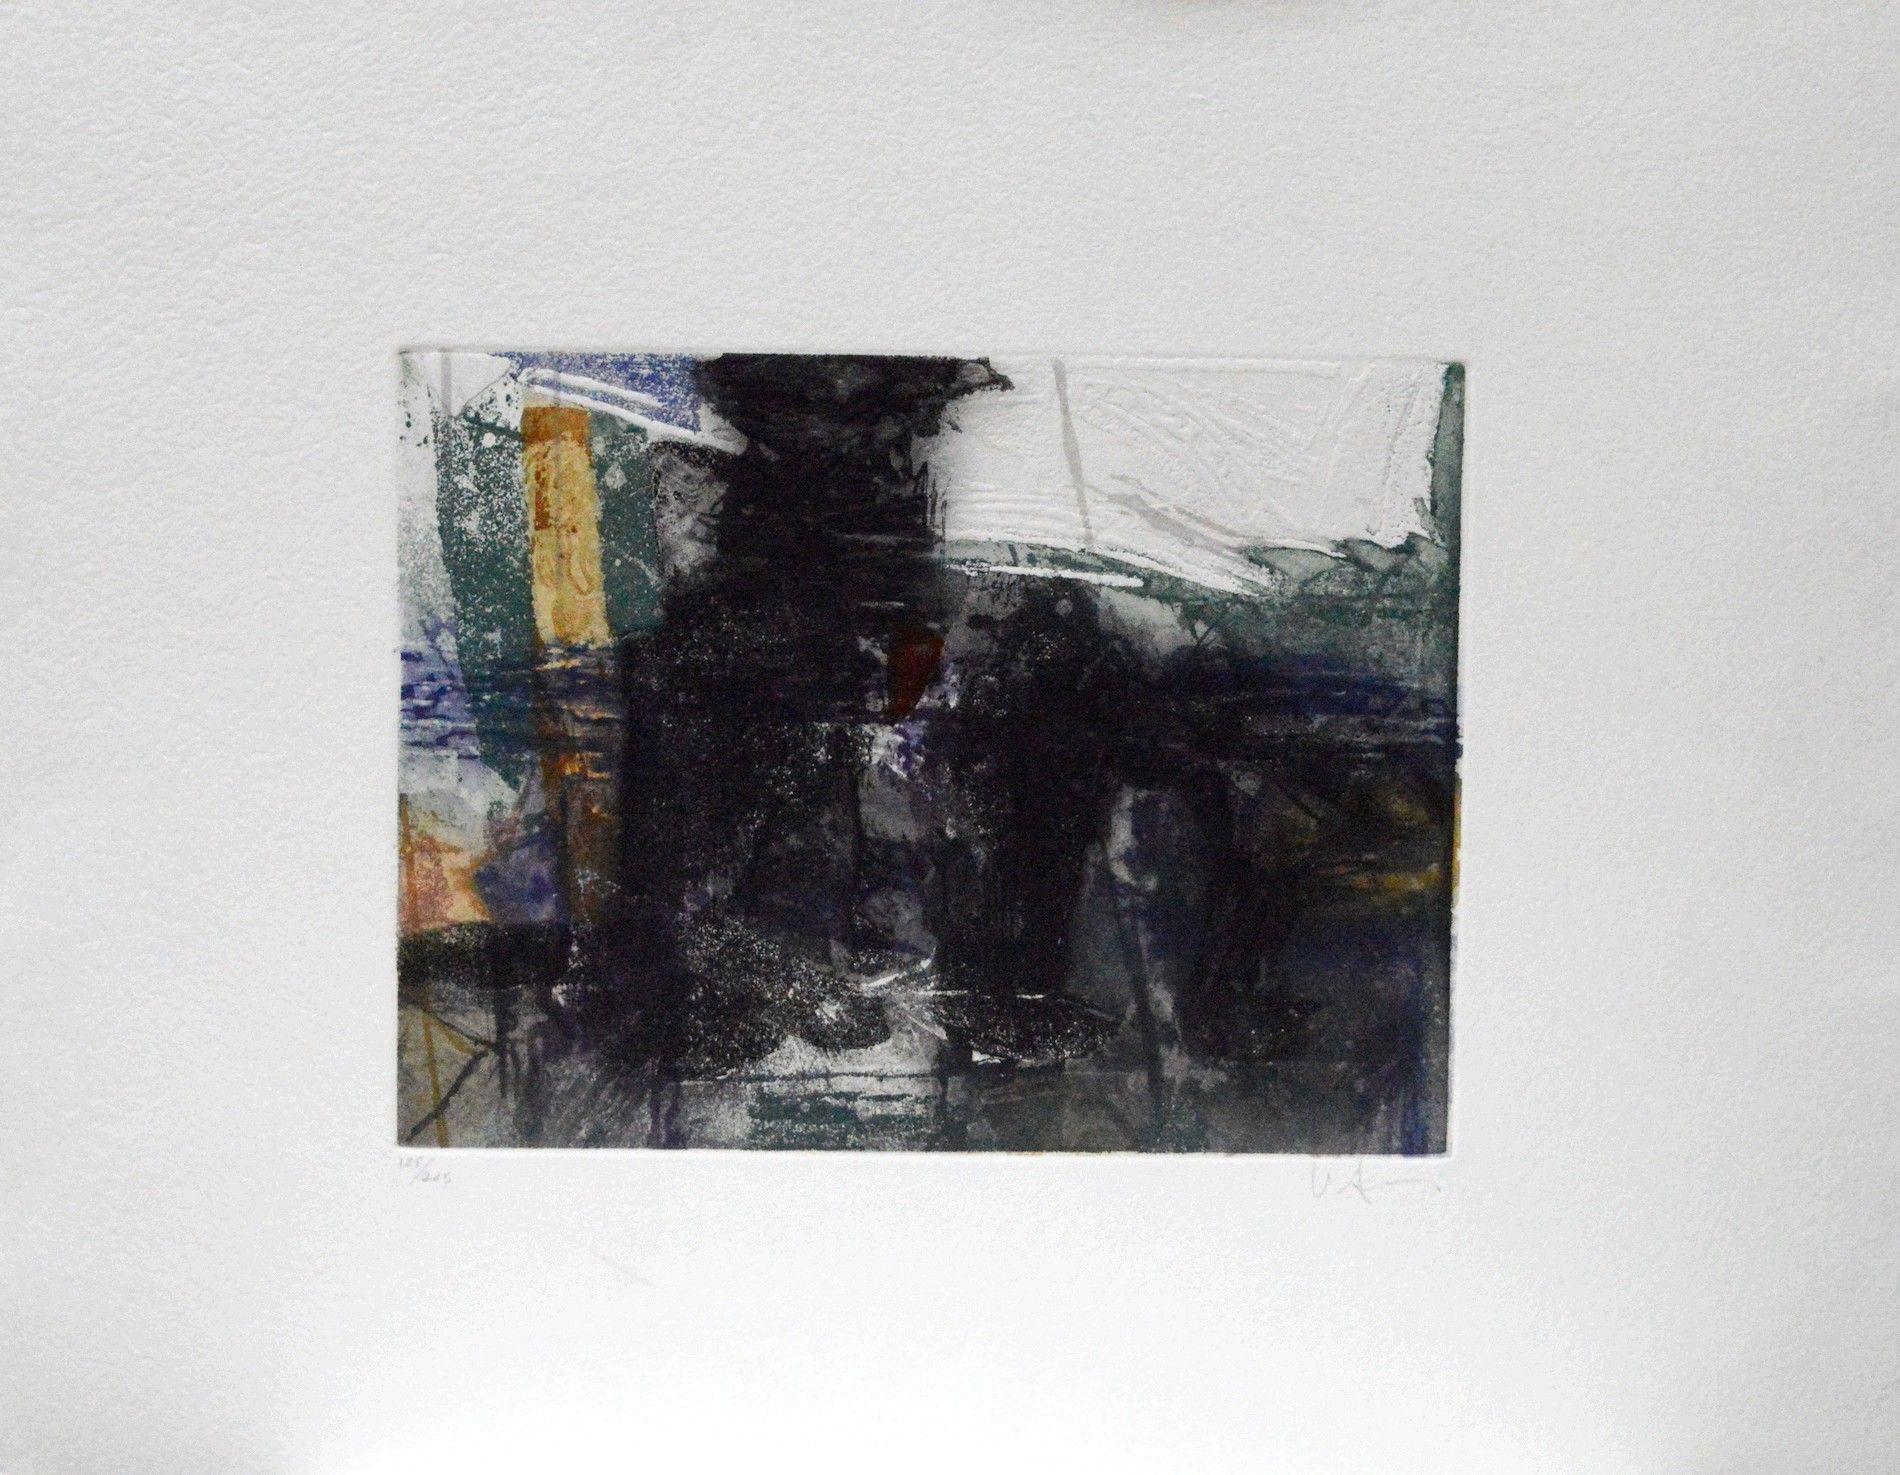 Arribas, Venancio, Kunst, Galerie Voigt, Nürnberg